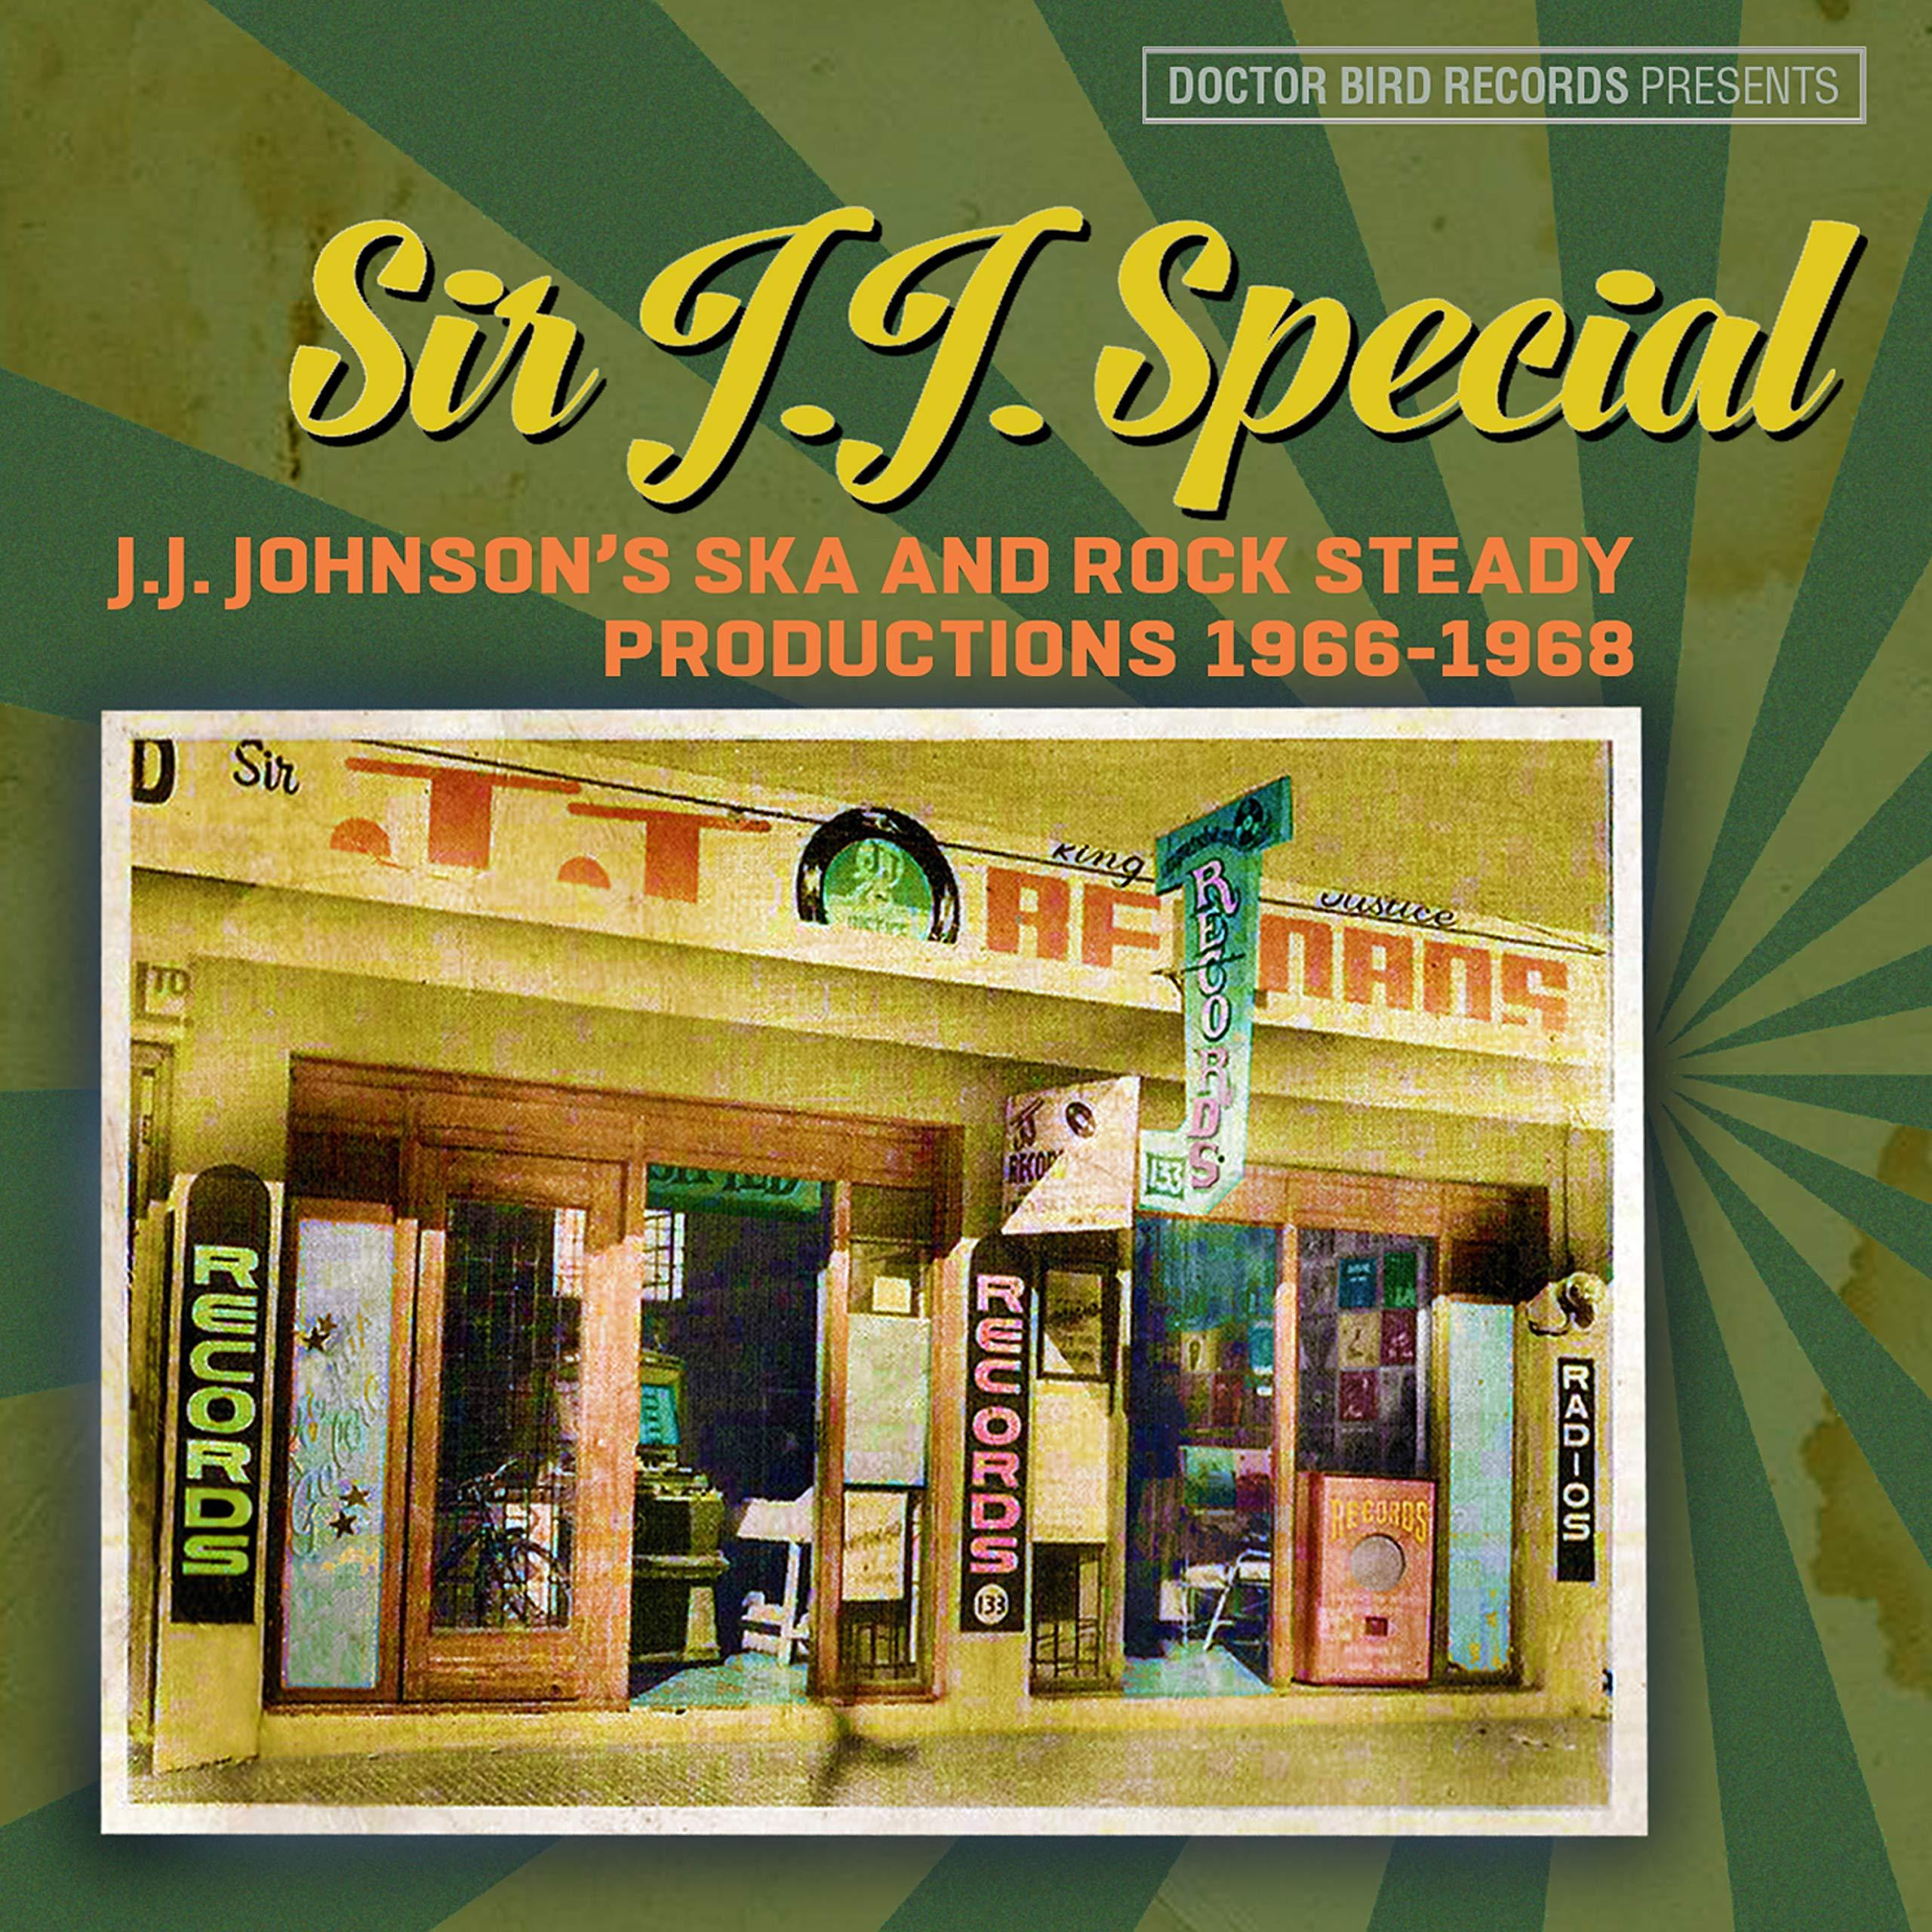 VA - Sir J.J. Special J.J.Johnson's Ska And Rock Steady Productions 1966-1968 (2020) [FLAC] Download